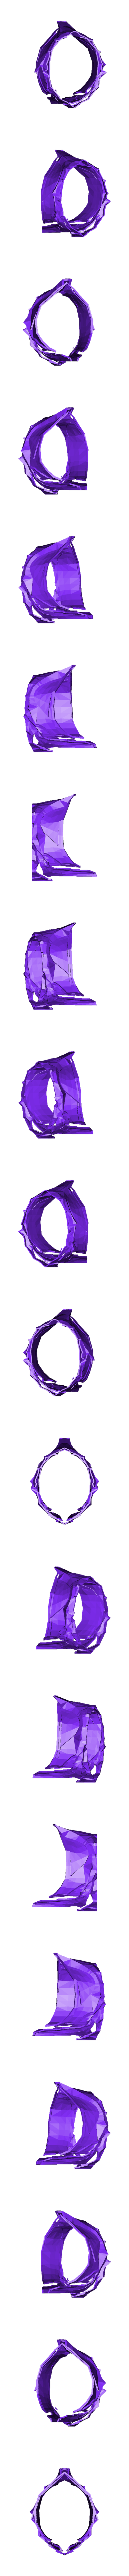 Sauron_Armor-_Helmet_bottom_Half.stl Download free STL file Sauron Armor - Helmet • 3D printable template, arifsethi